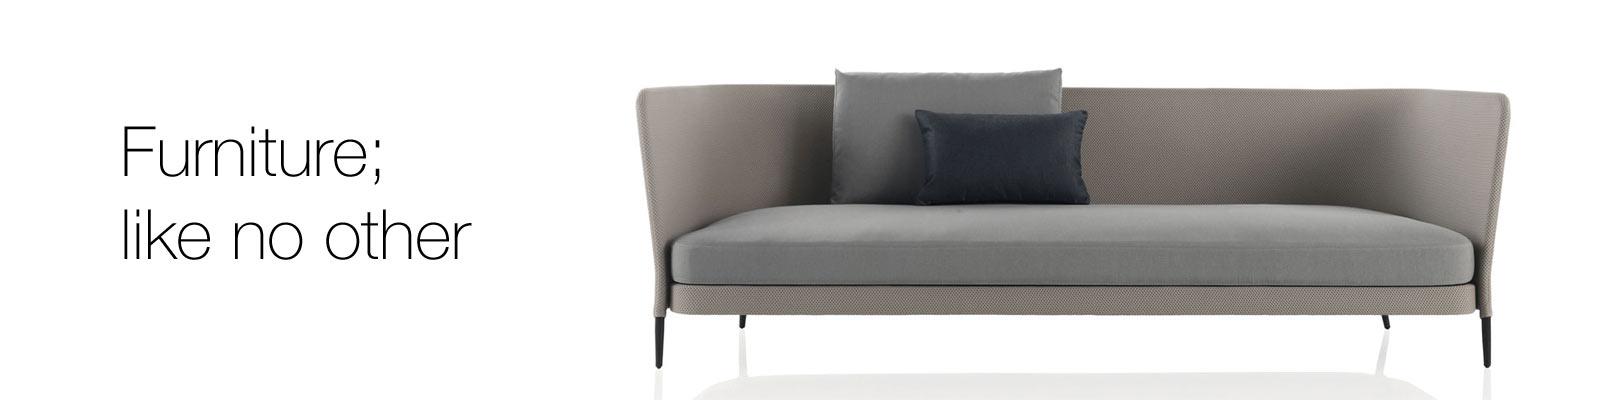 Furniture for the Algarve 2